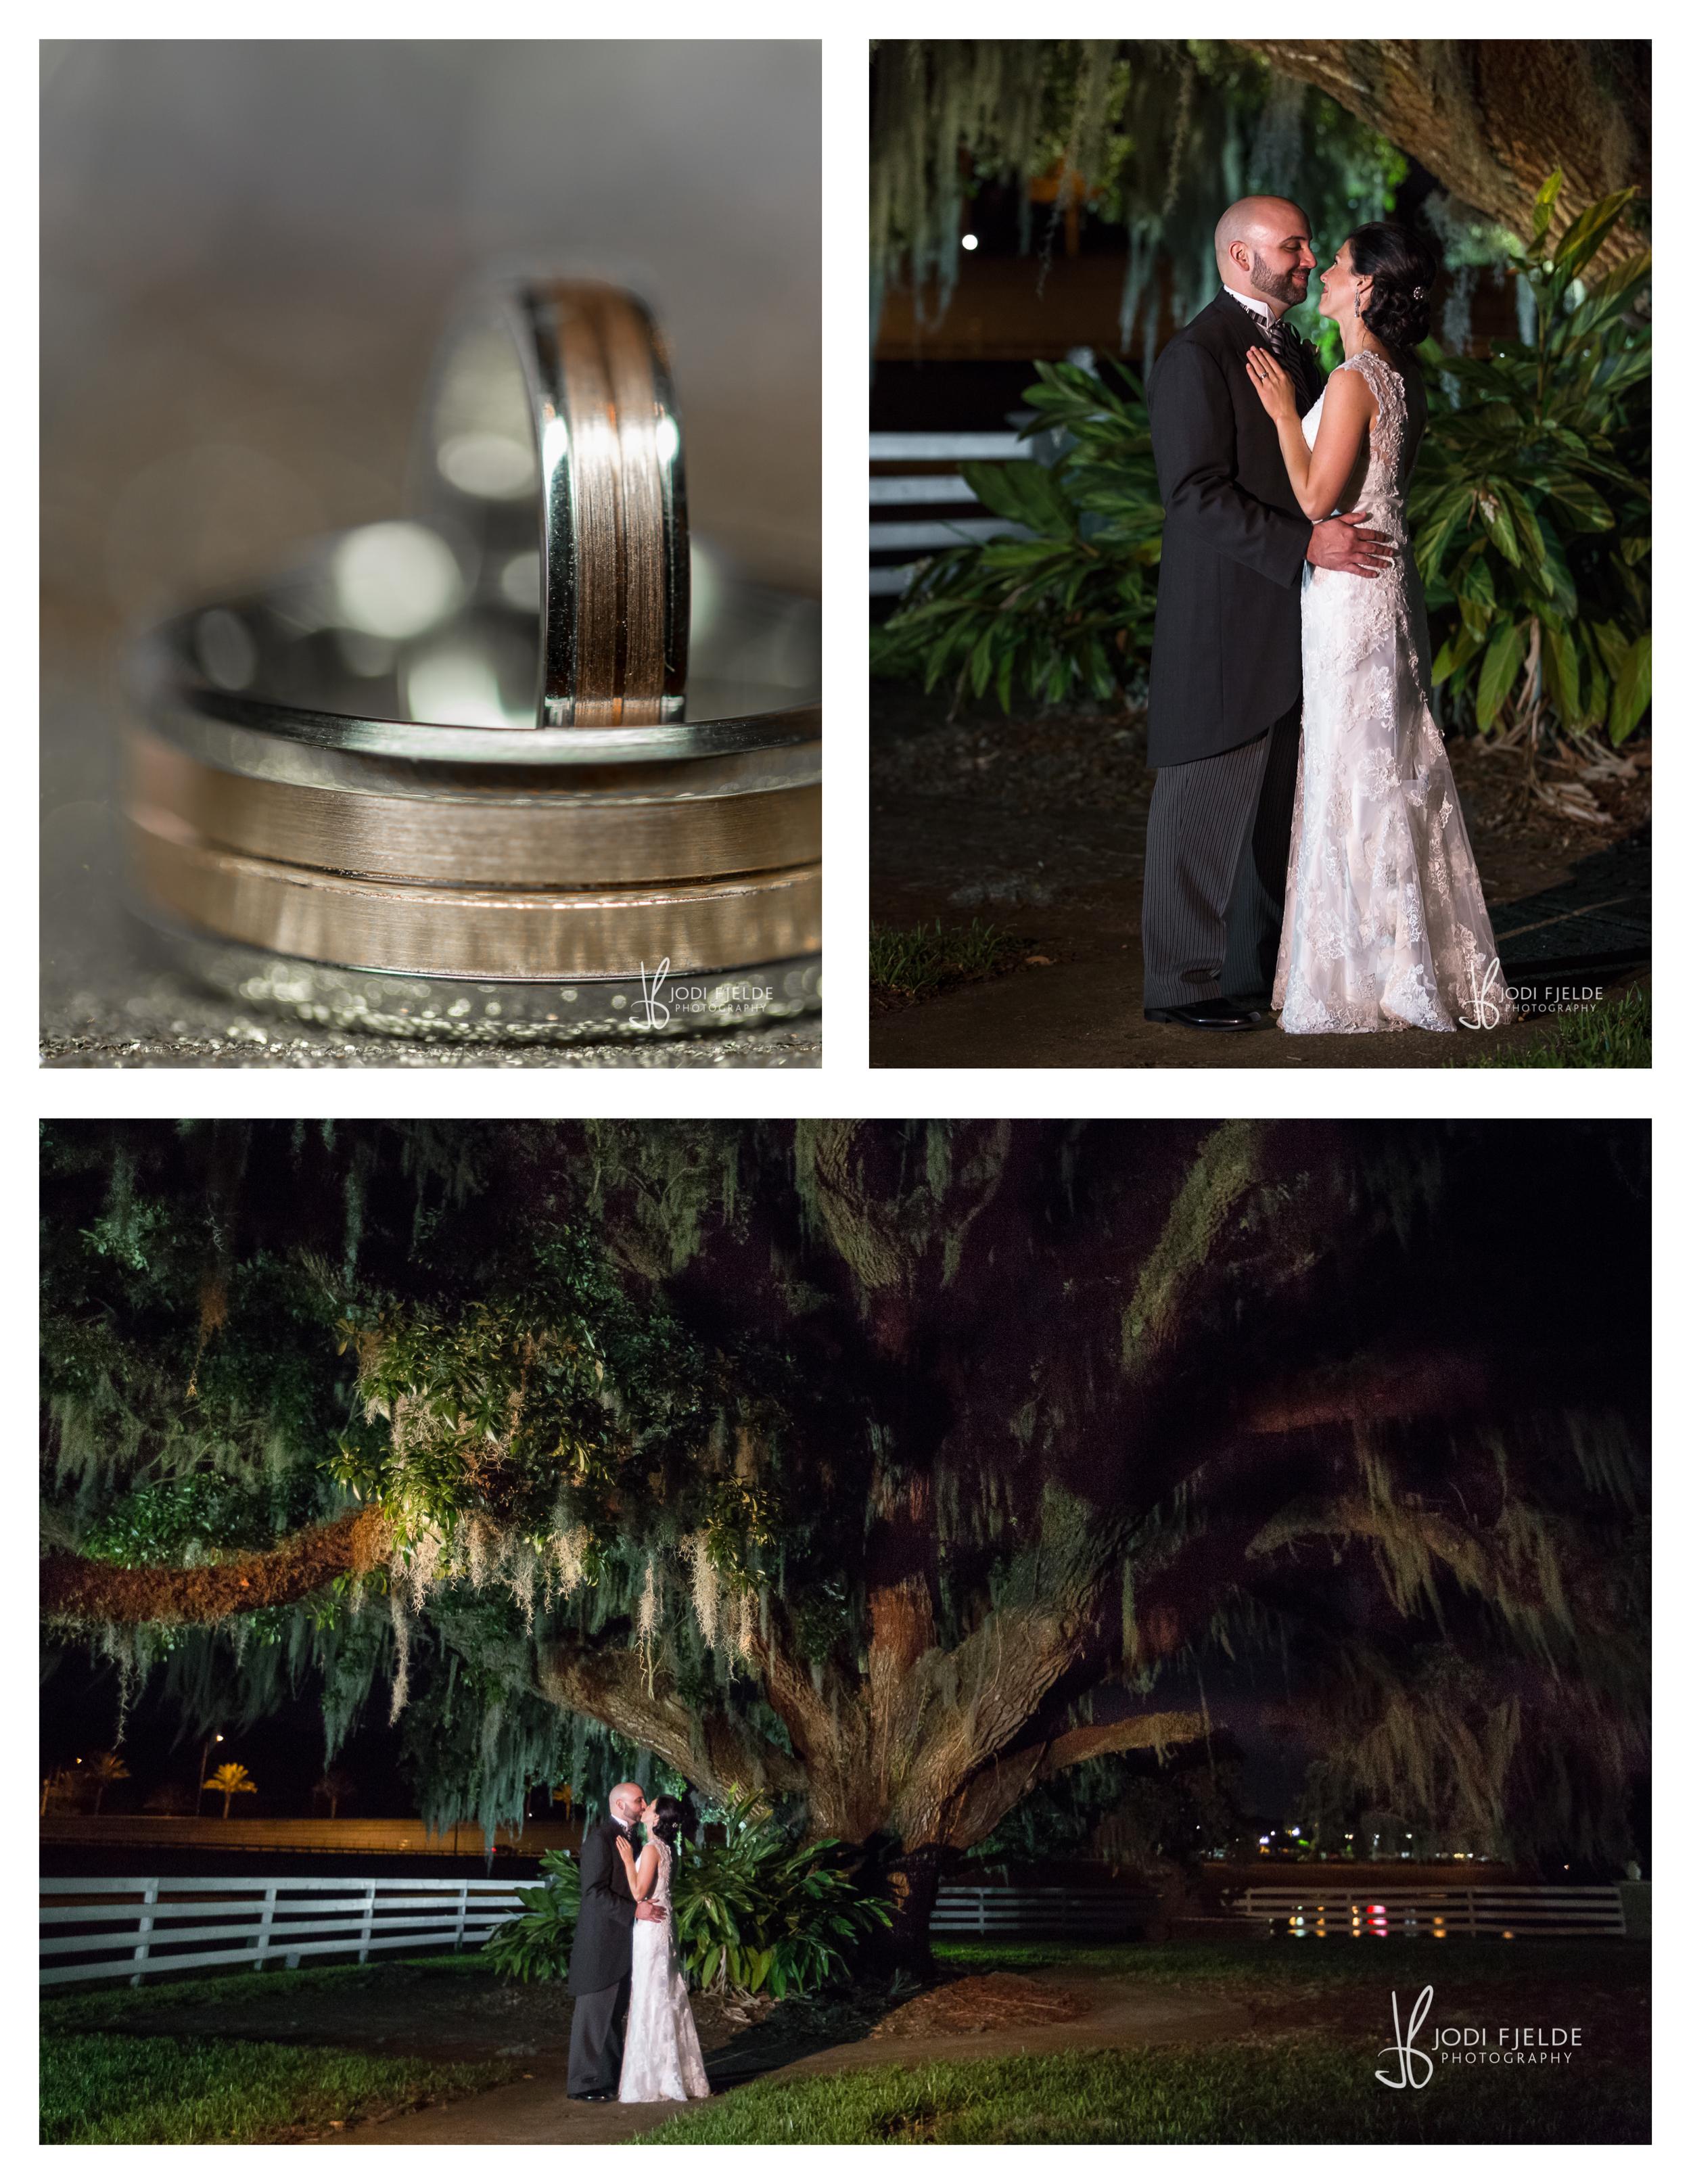 Highland_Manor_Apopka_Florida_wedding_Jackie_&_Tim_photography_jodi_Fjelde_photography-37.jpg